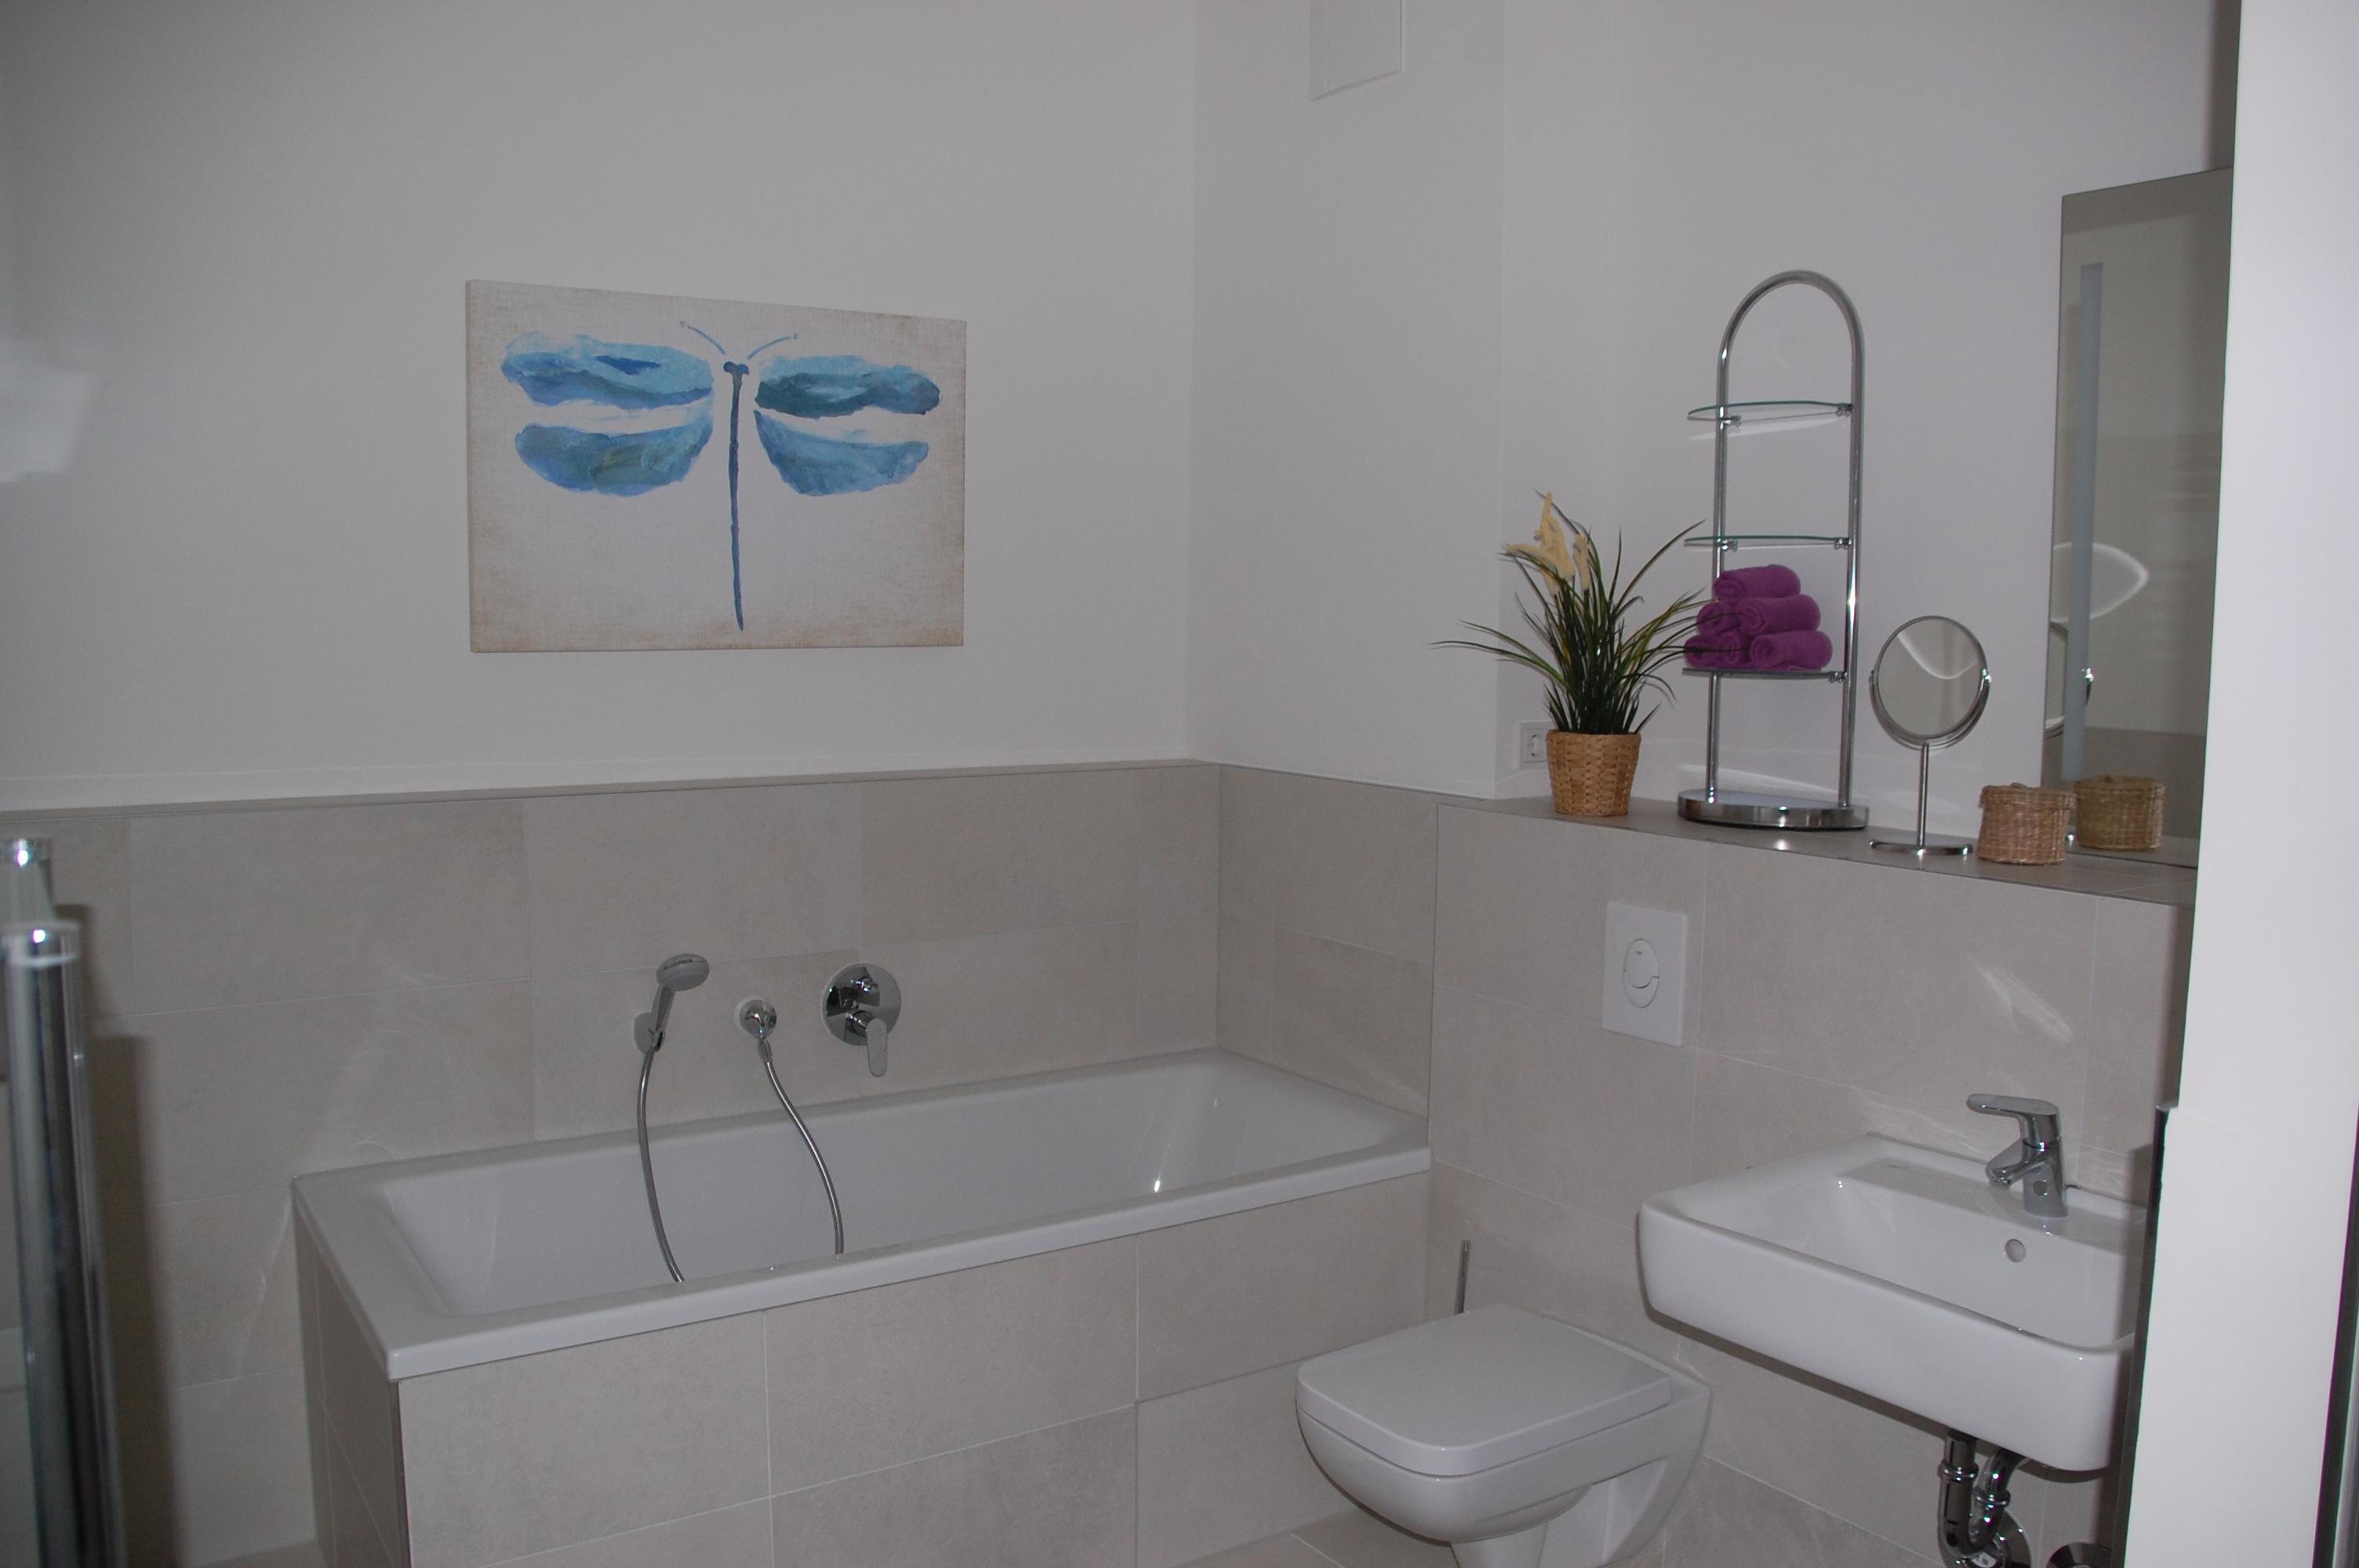 Retro-Badezimmer: So bringst du Nostalgie ins Bad!